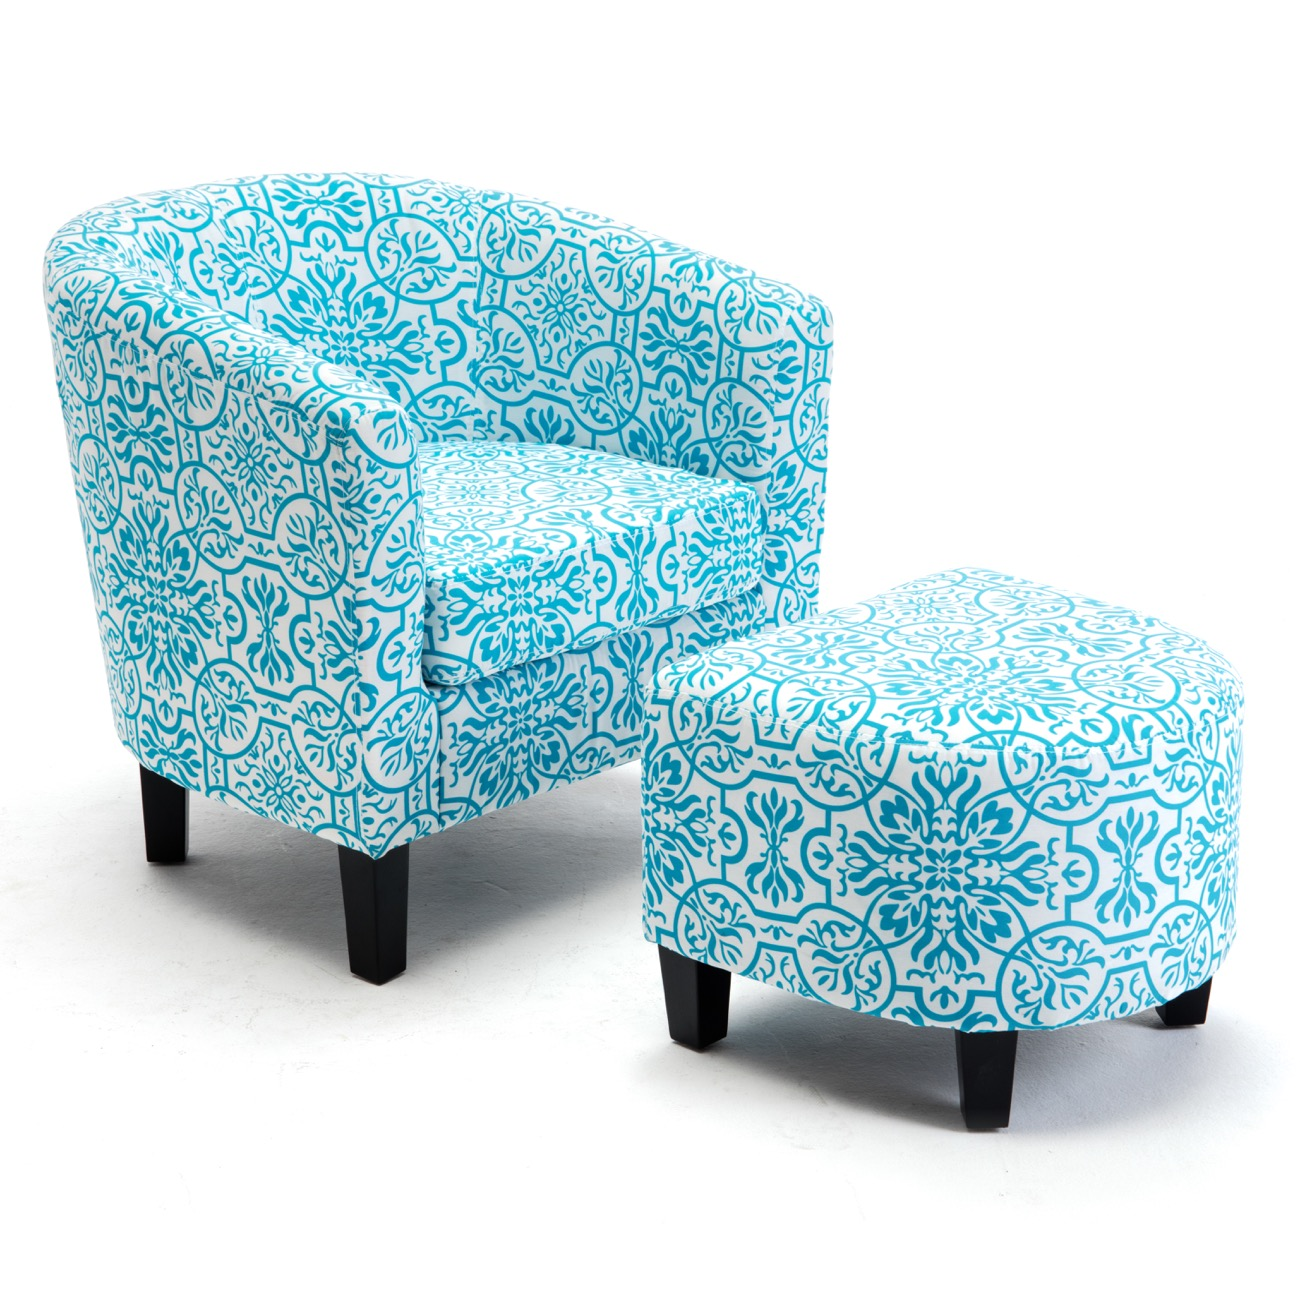 BELLEZE Modern Barrel Accent Chair with Ottoman Linen Round Arms Footrest Set by Belleze